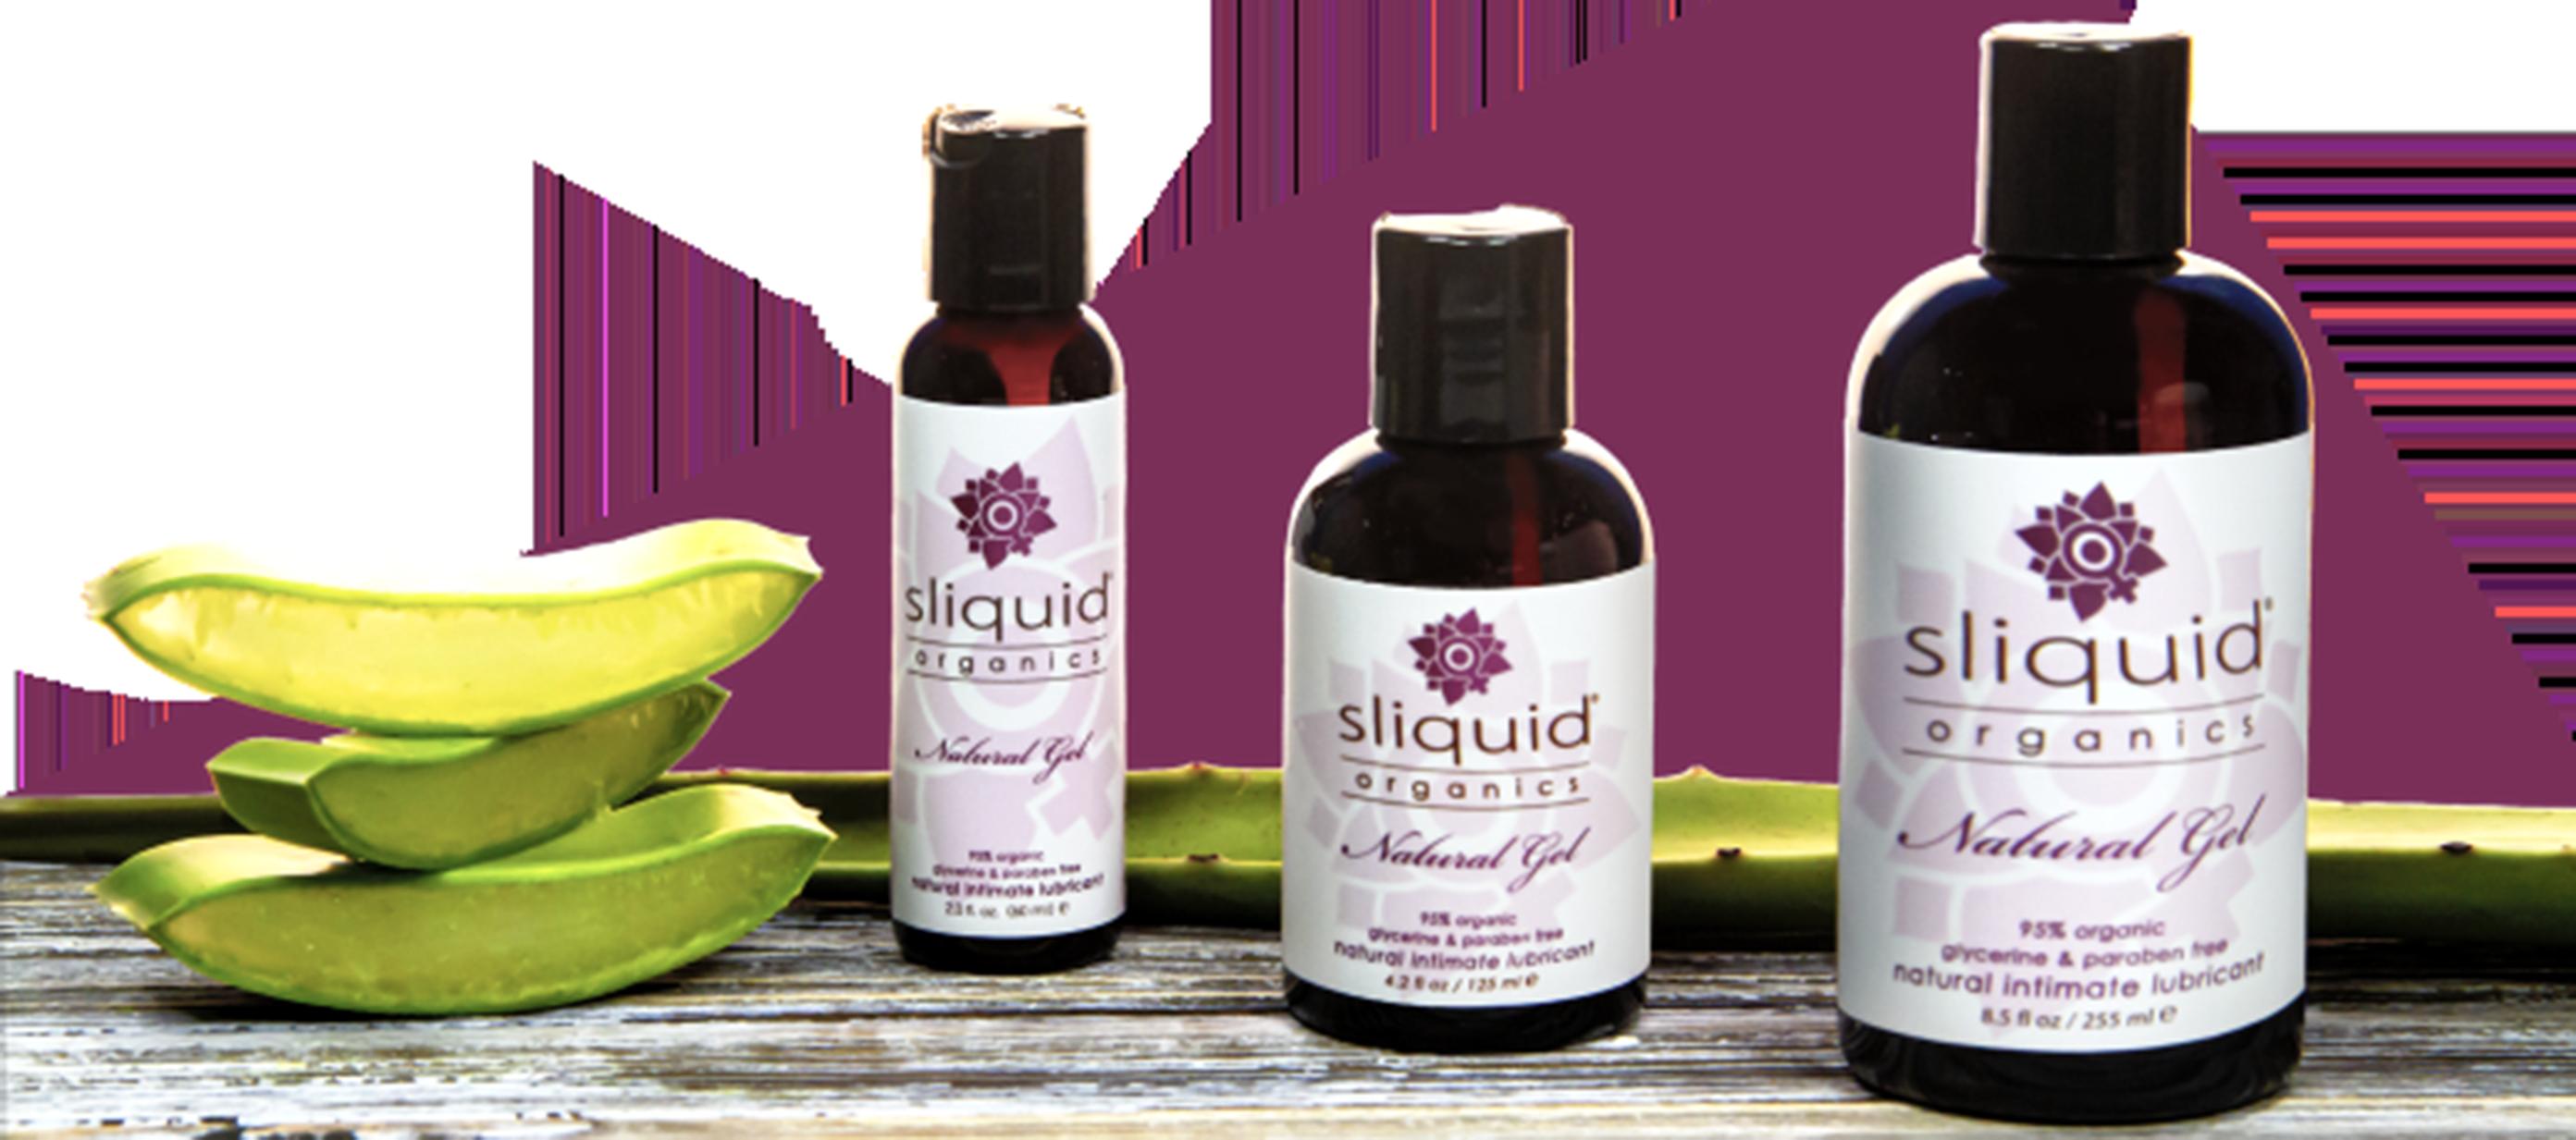 Natural Gel Product